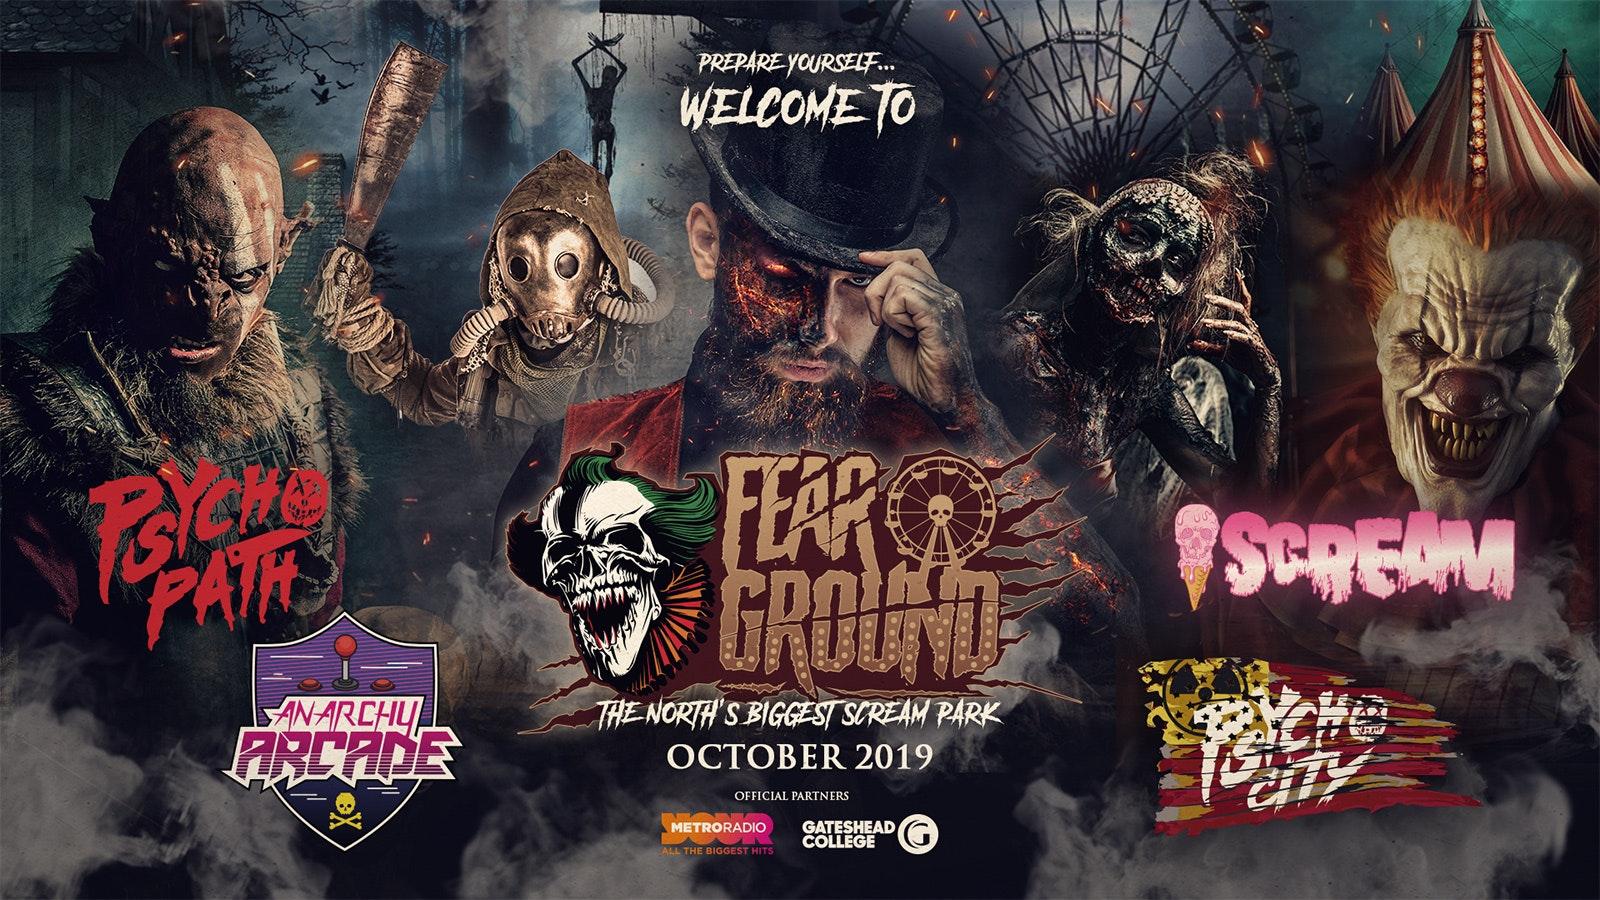 Psycho Path – Saturday 19th October 2019